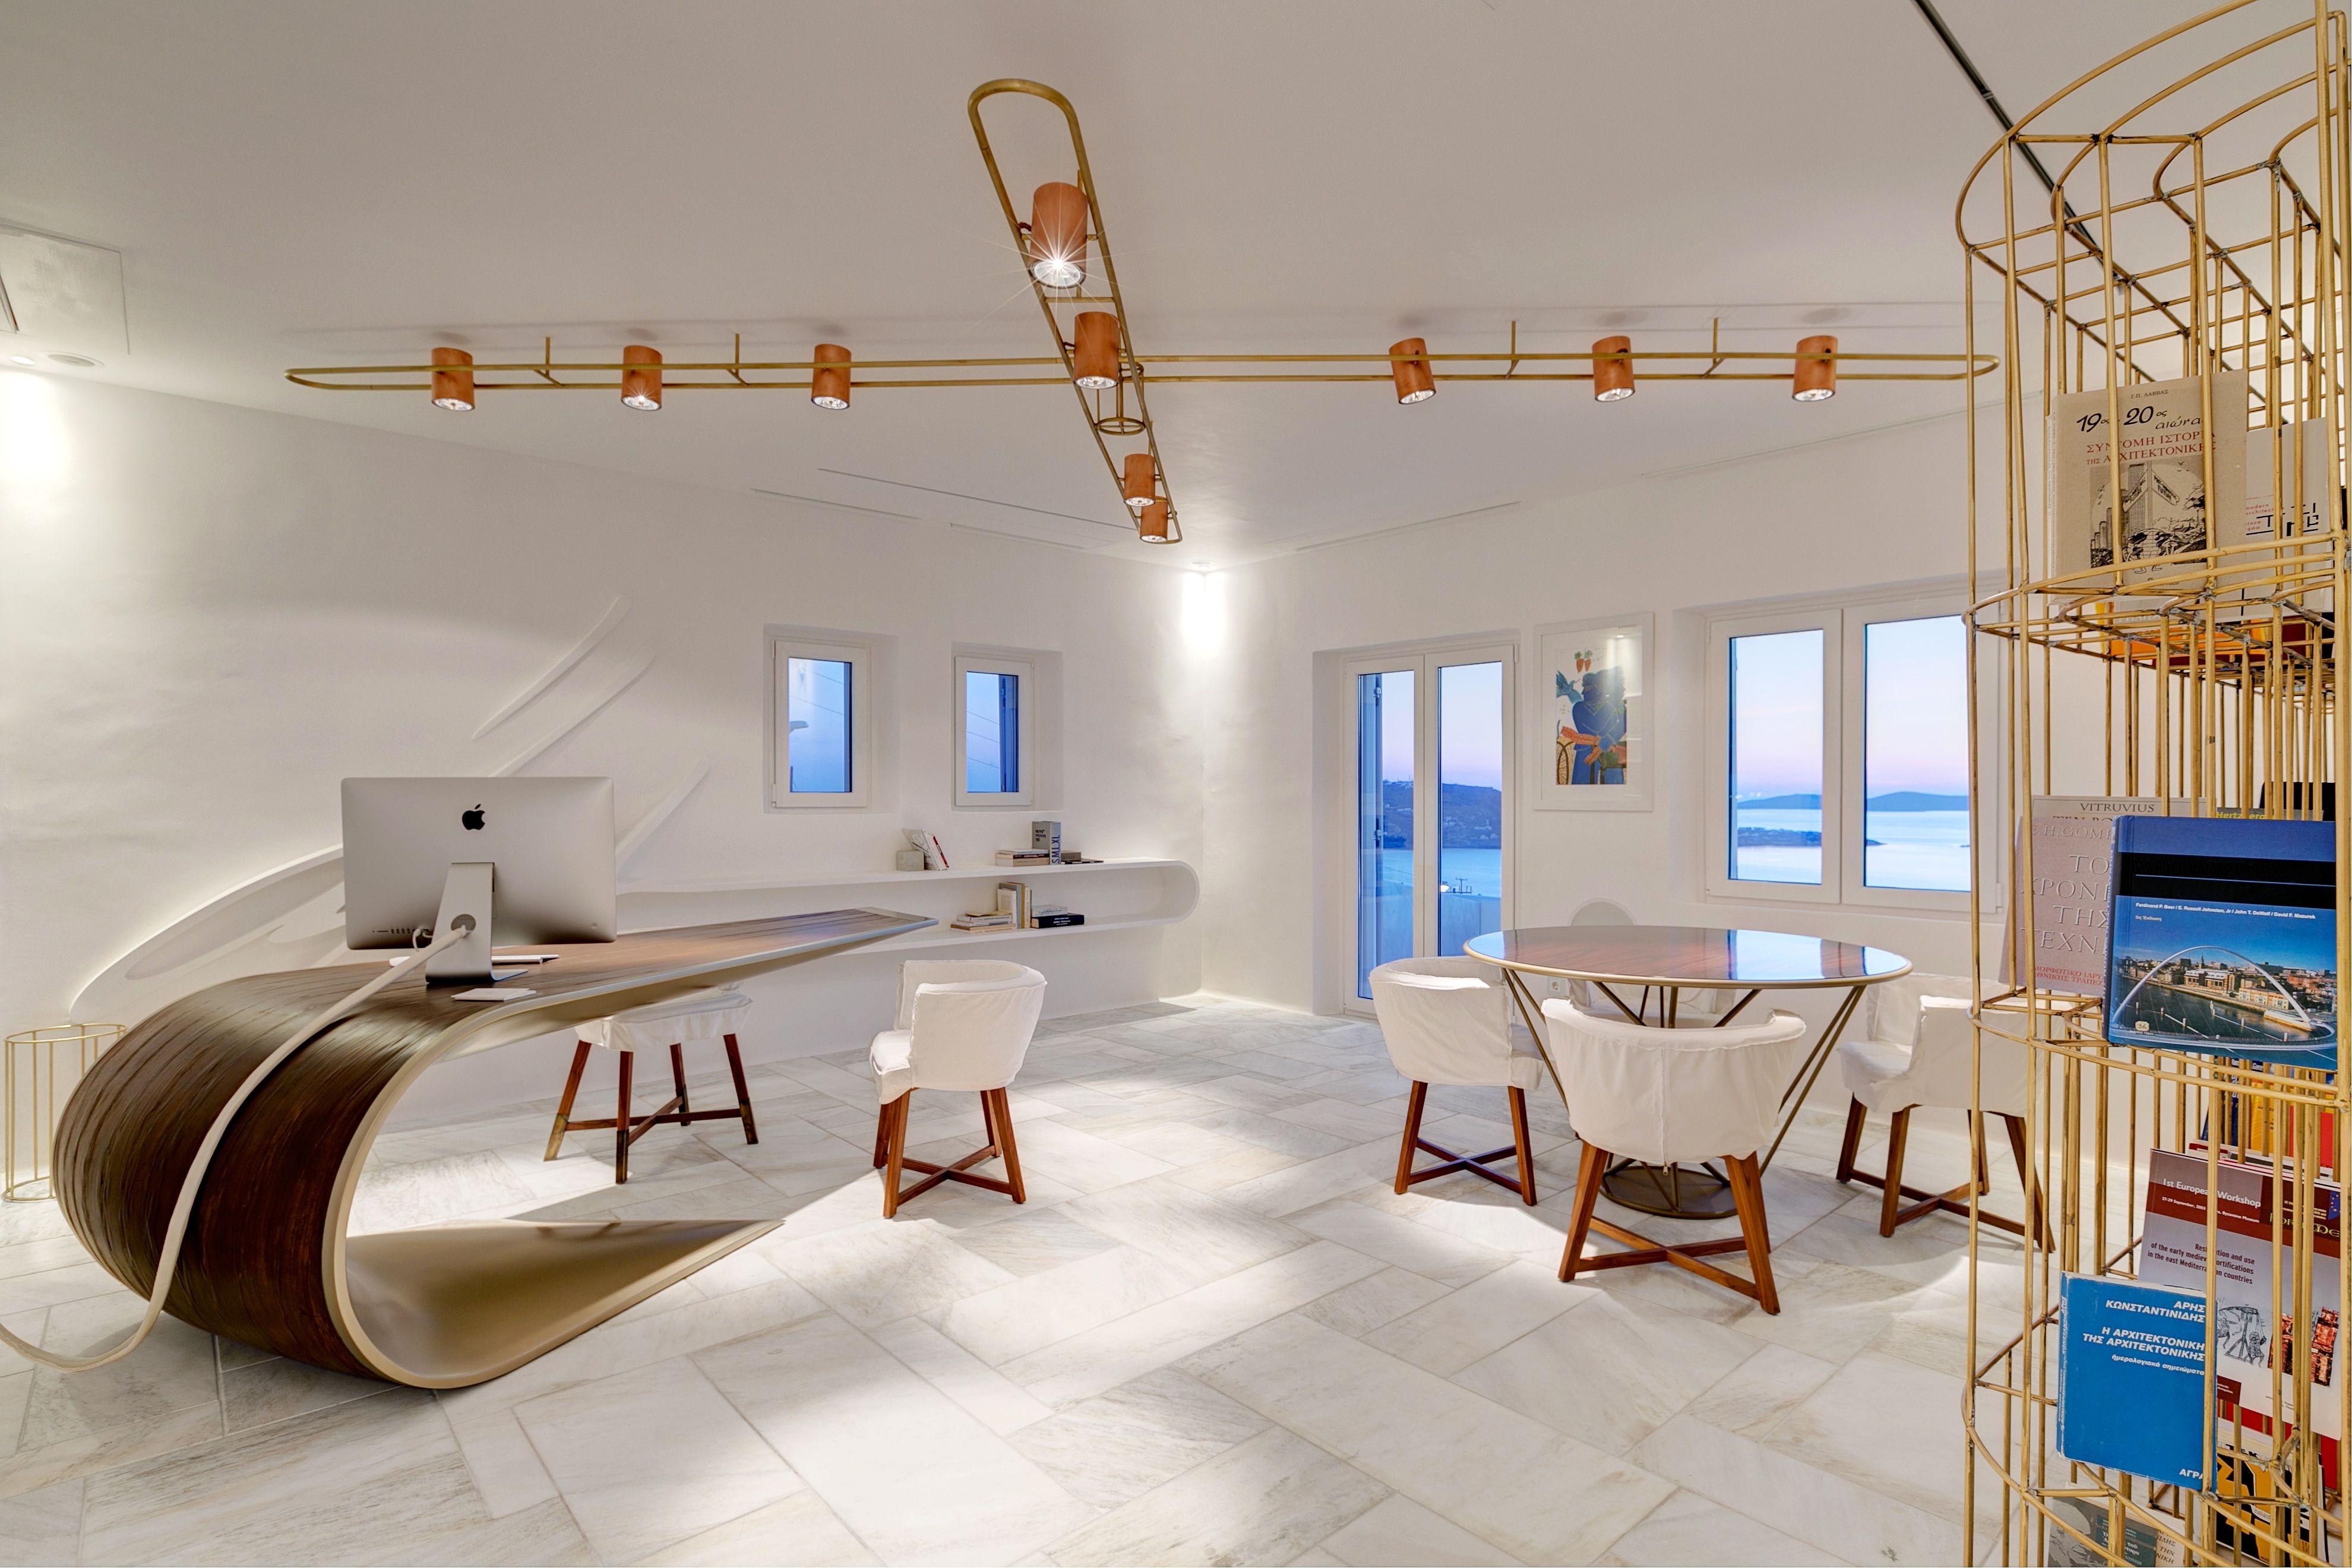 Mykonos Office Design Eleftherios Ambatzis Structural Engineer Spyridon Apostolou Design Home Decor Public Architecture